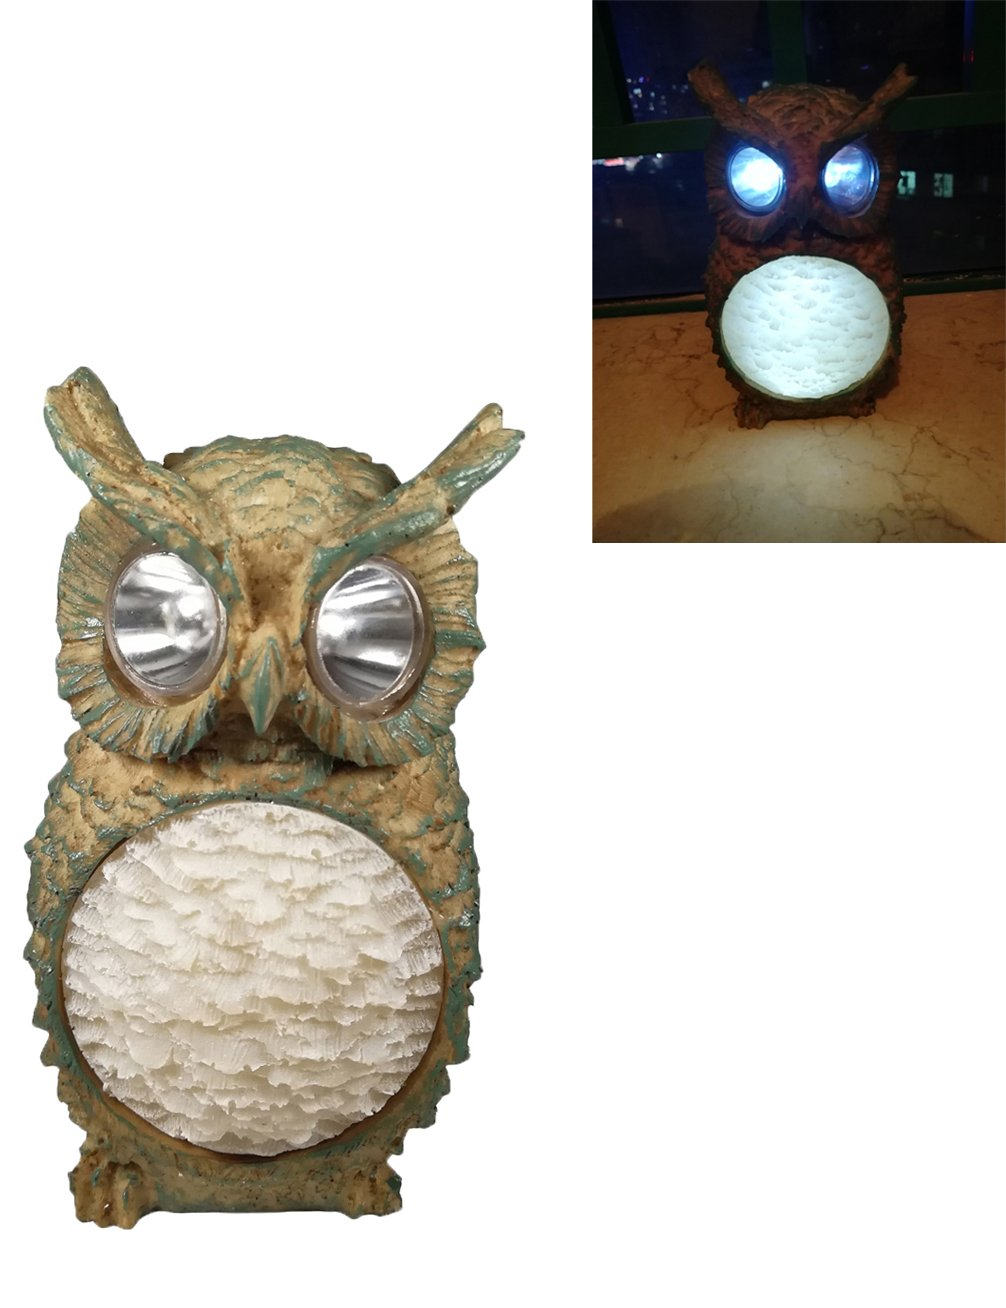 Luwint LED Solar Outdoor Garden Lights - Wireless Waterproof Polyresin Owl Night Light for Yard Home Decor (Upgraded Green)